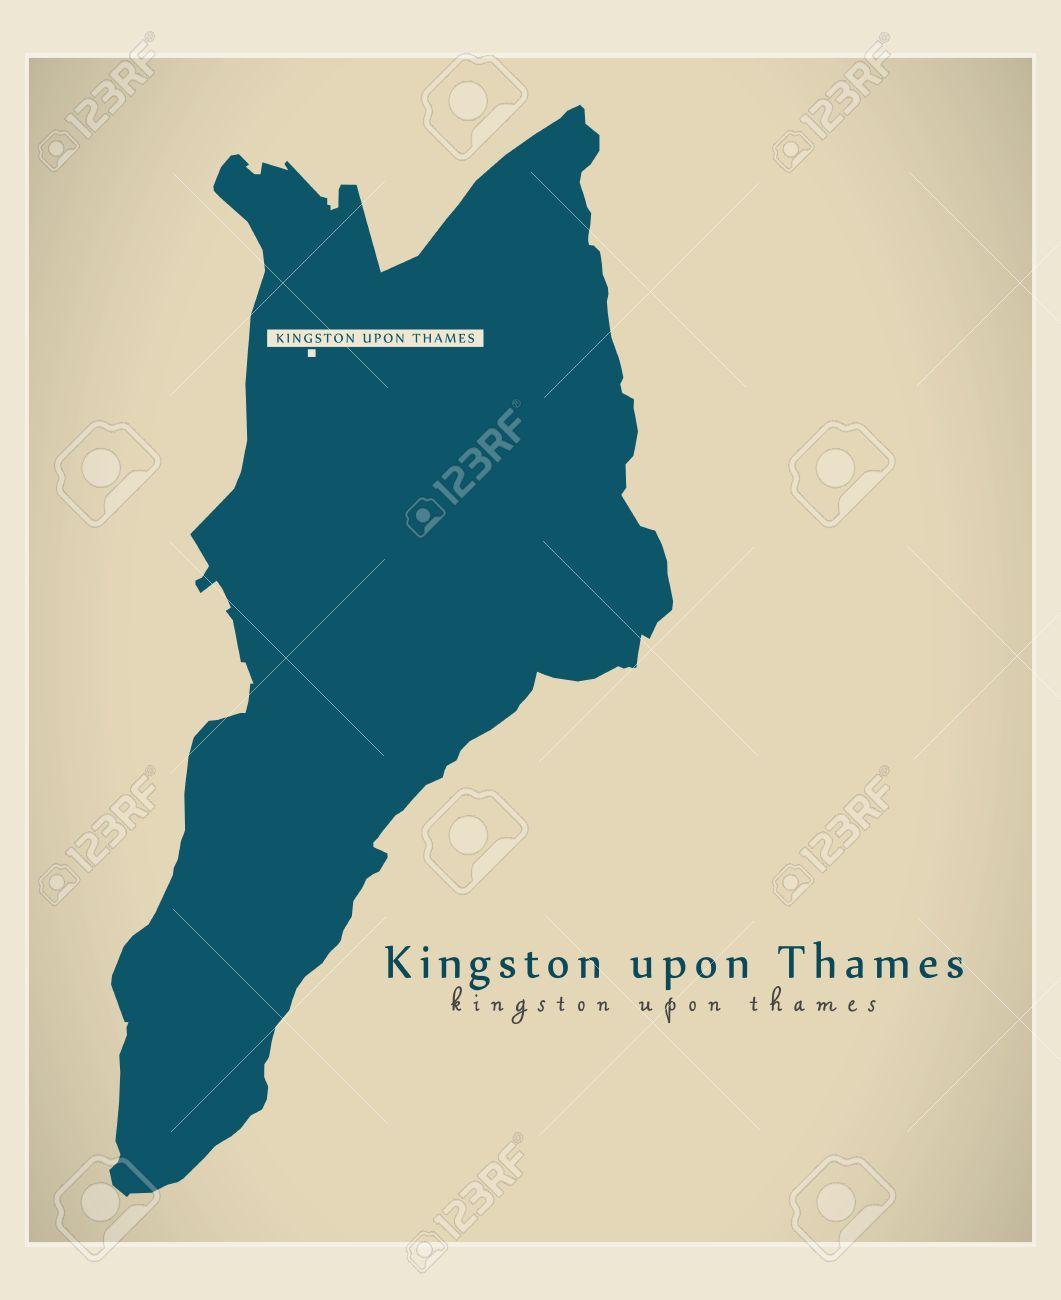 Karte London Stadtteile.Stock Photo